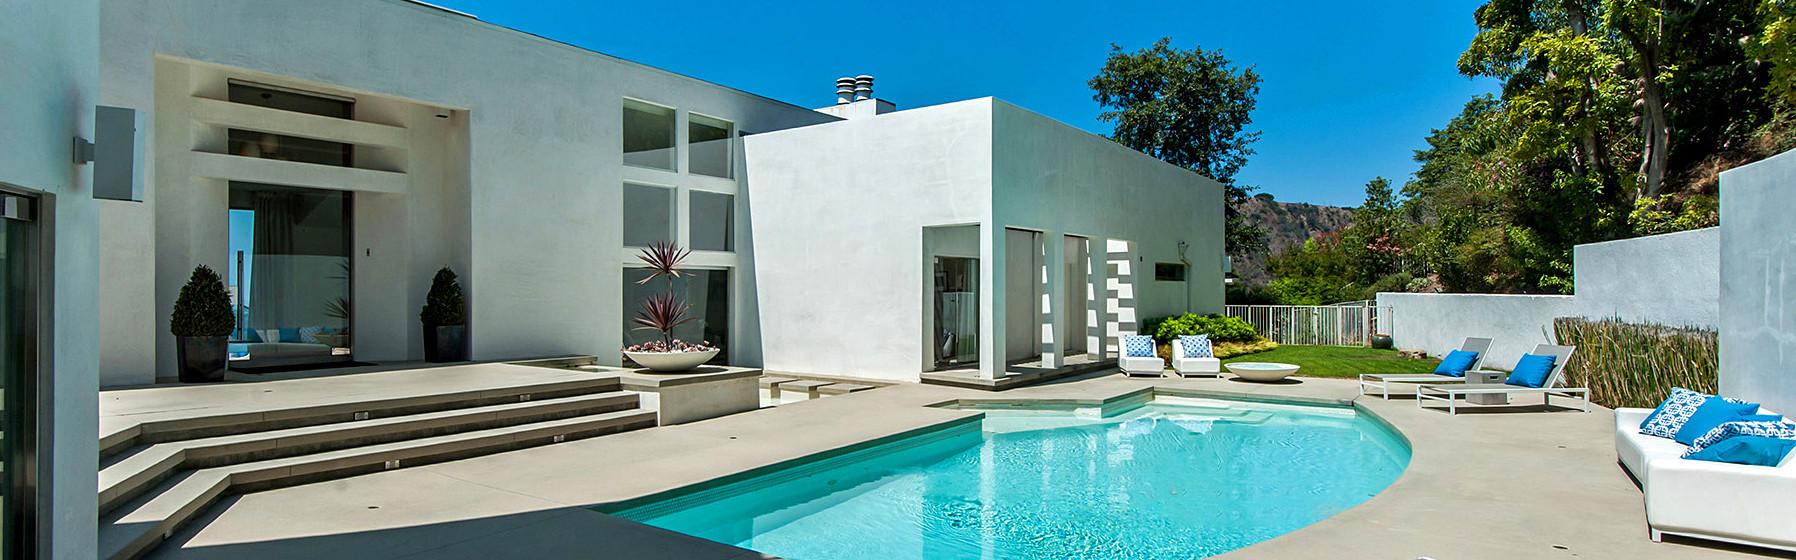 Hot Property - Celebrity \u0026 Luxury Homes - Los Angeles Times